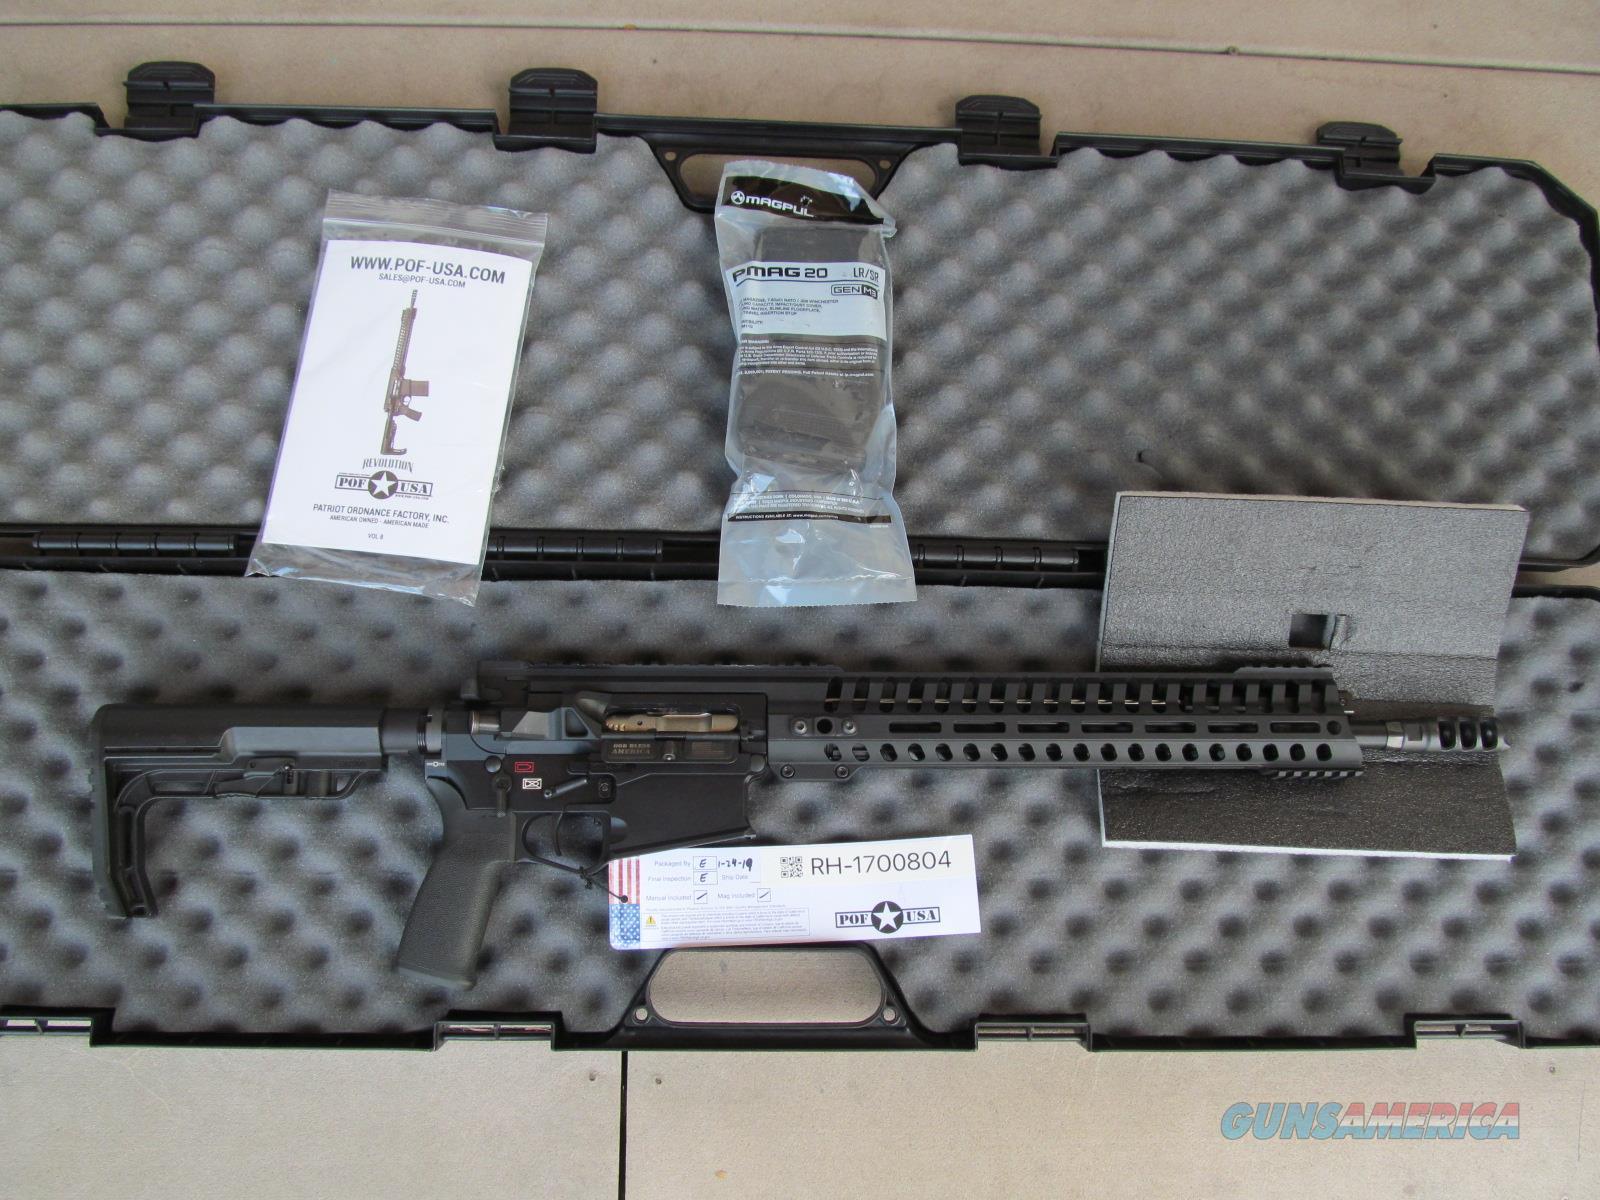 "POF Revolution Gen 4 308 Rifle 16.5"" (AR, AR15, COLT, BUSHMASTER, DPMS, ROCK, ARMALITE, S&W, DANIEL, STAG, LMT, LWRC, SIG, RUGER, PWS, HK, BARRETT, TRIJICON, EOTECH, NOVESKE, MAGPUL, TROY)  Guns > Rifles > Patriot Ordnance Factory - POF USA > Complete Rifles"